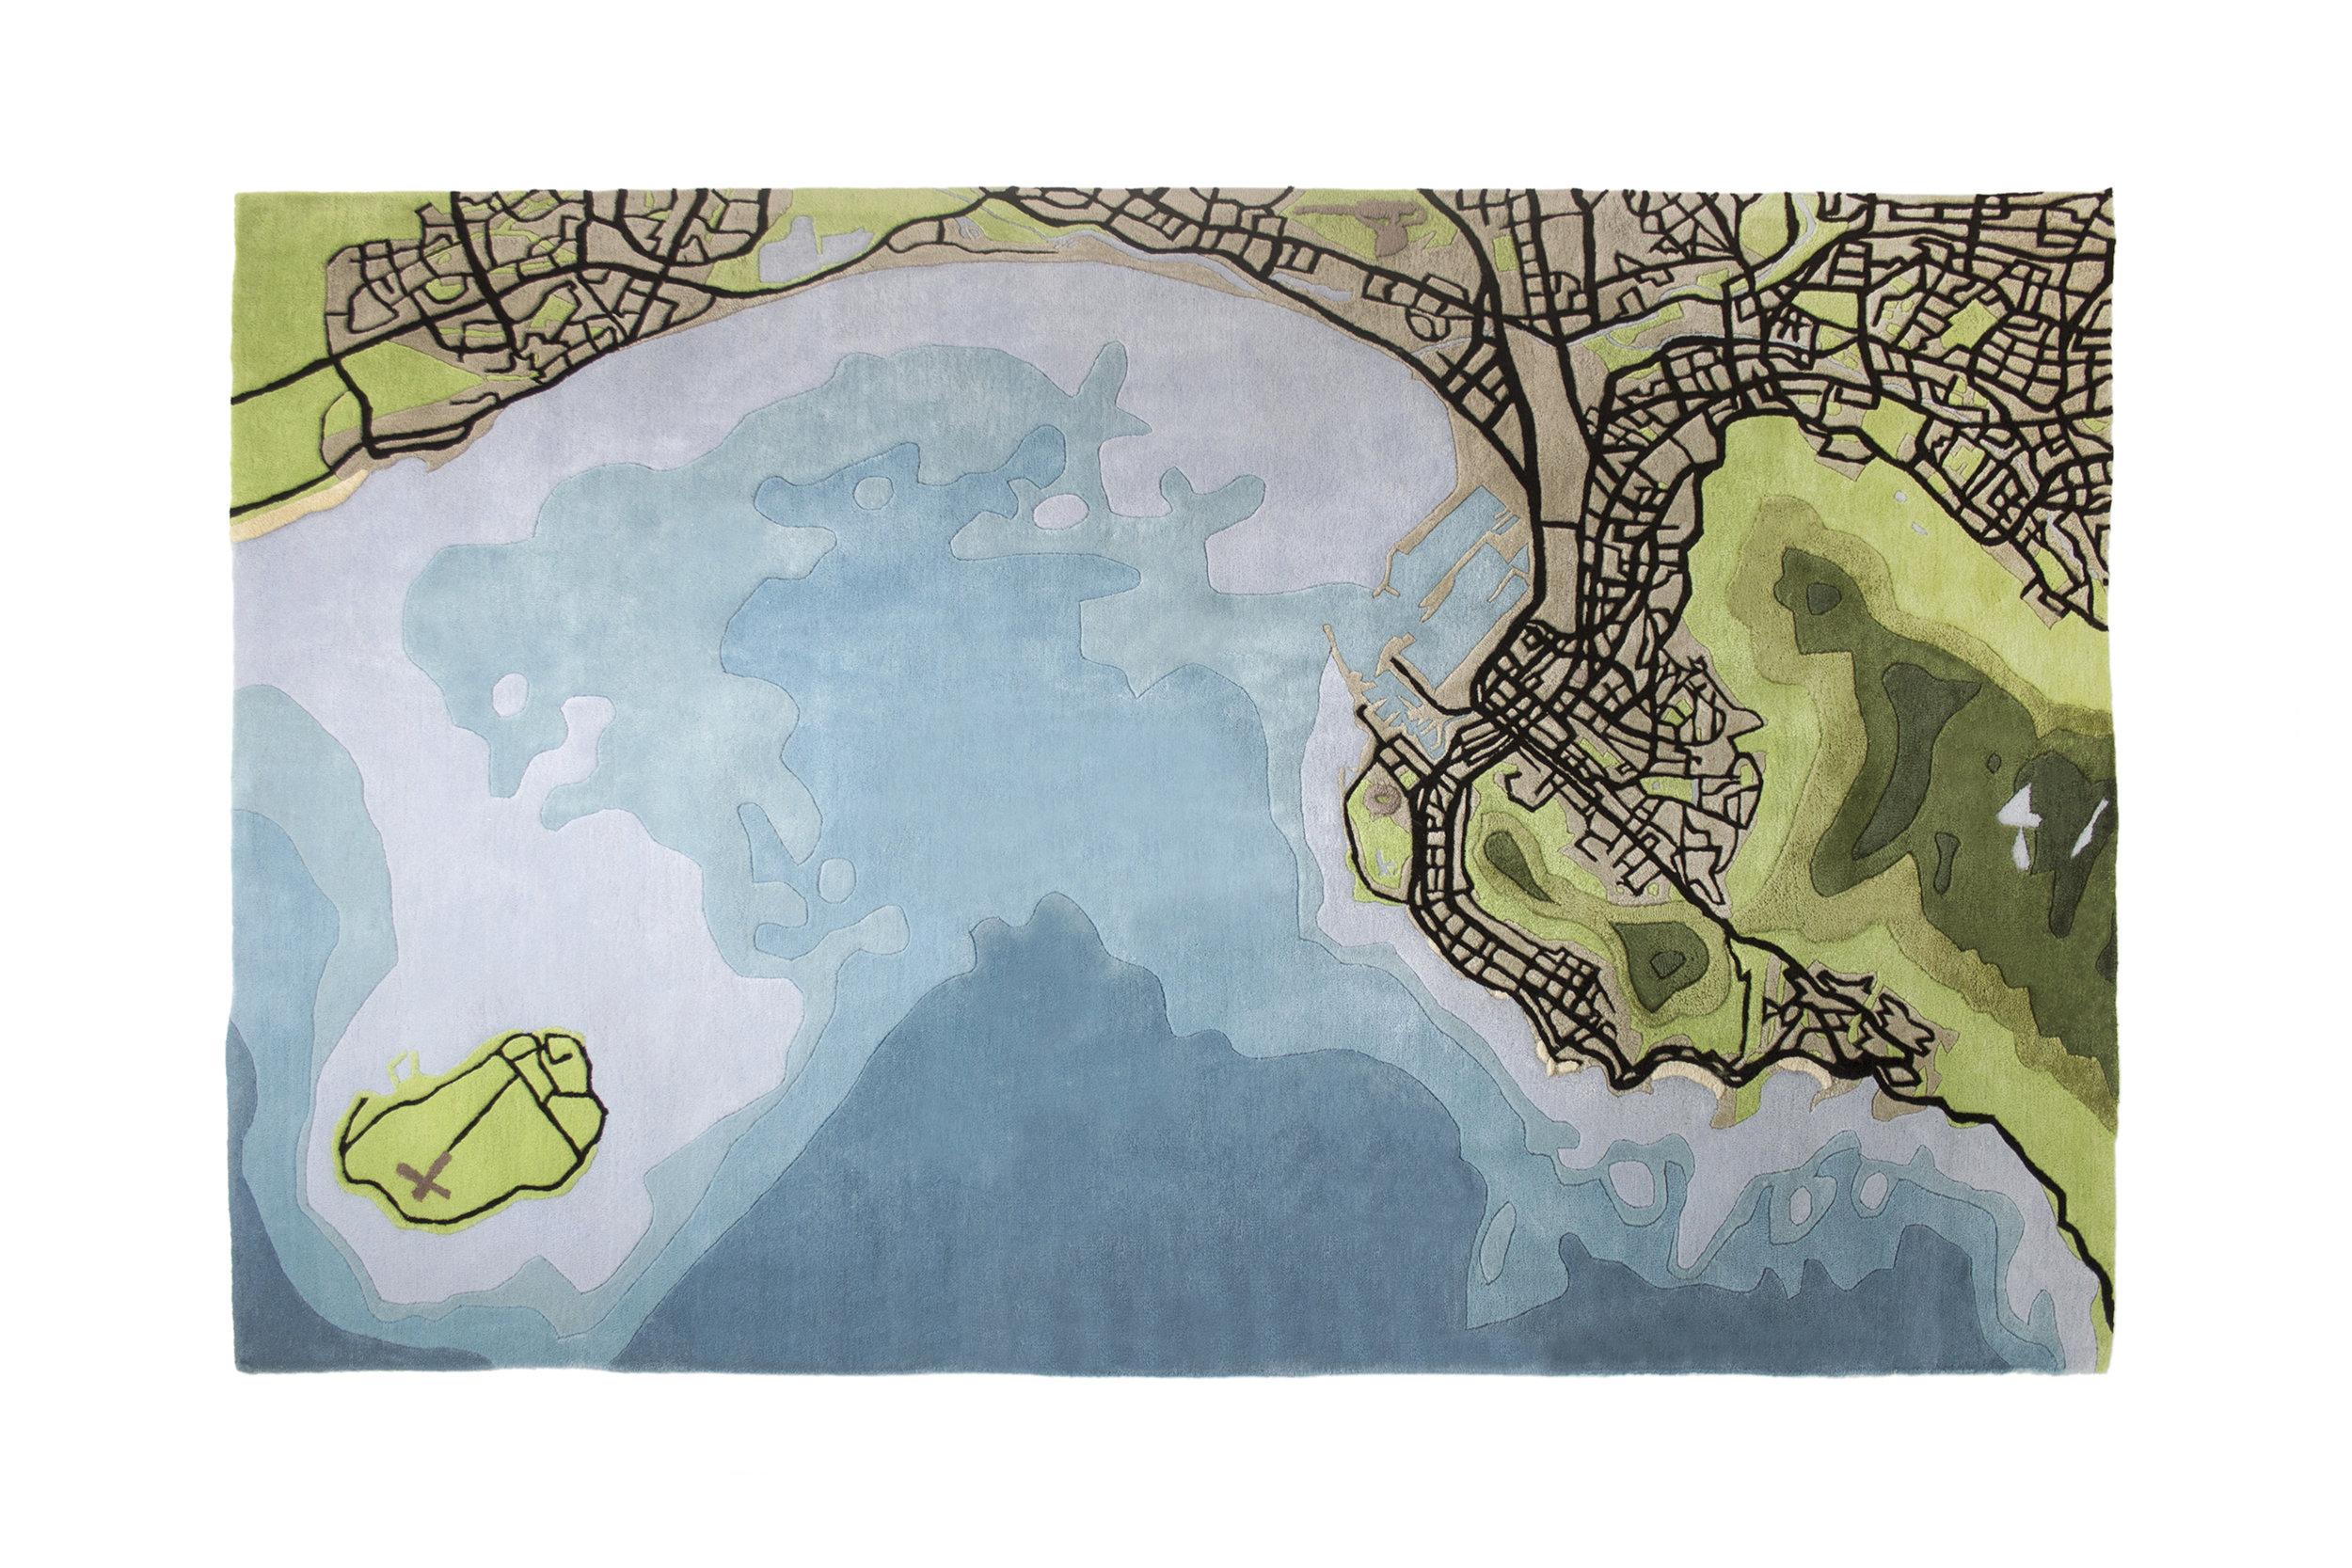 cape-town-carpet-shift-perspective-1.jpg